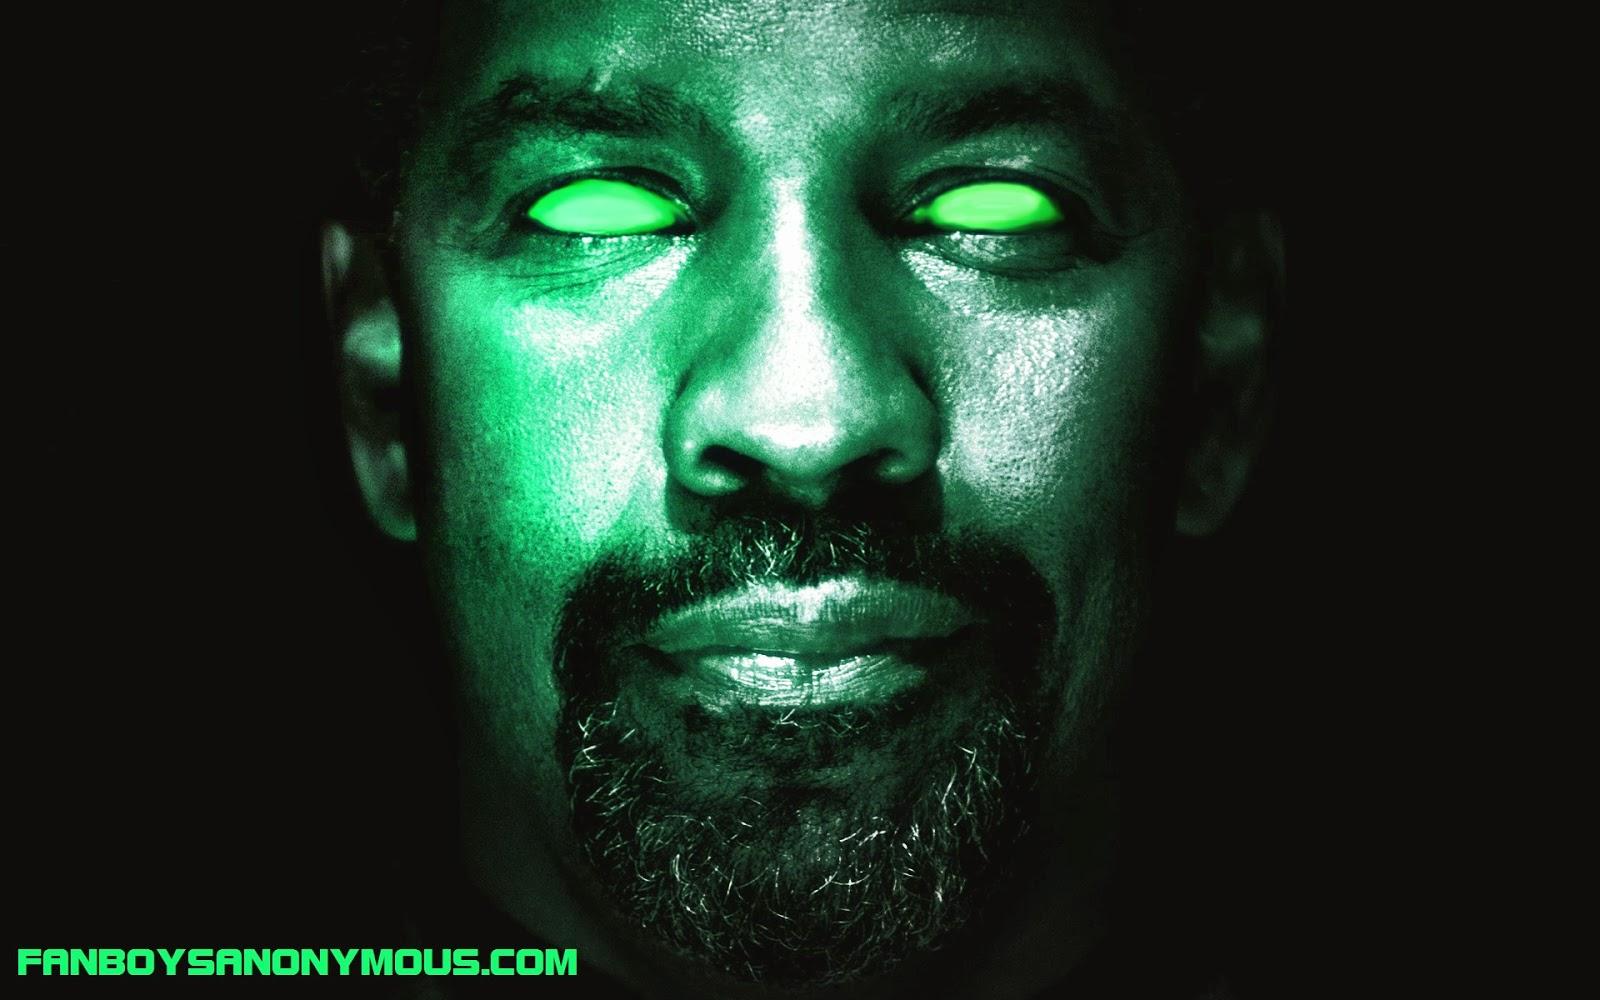 Book of Eli actor Denzel Washington mah nigga meme Green Lantern